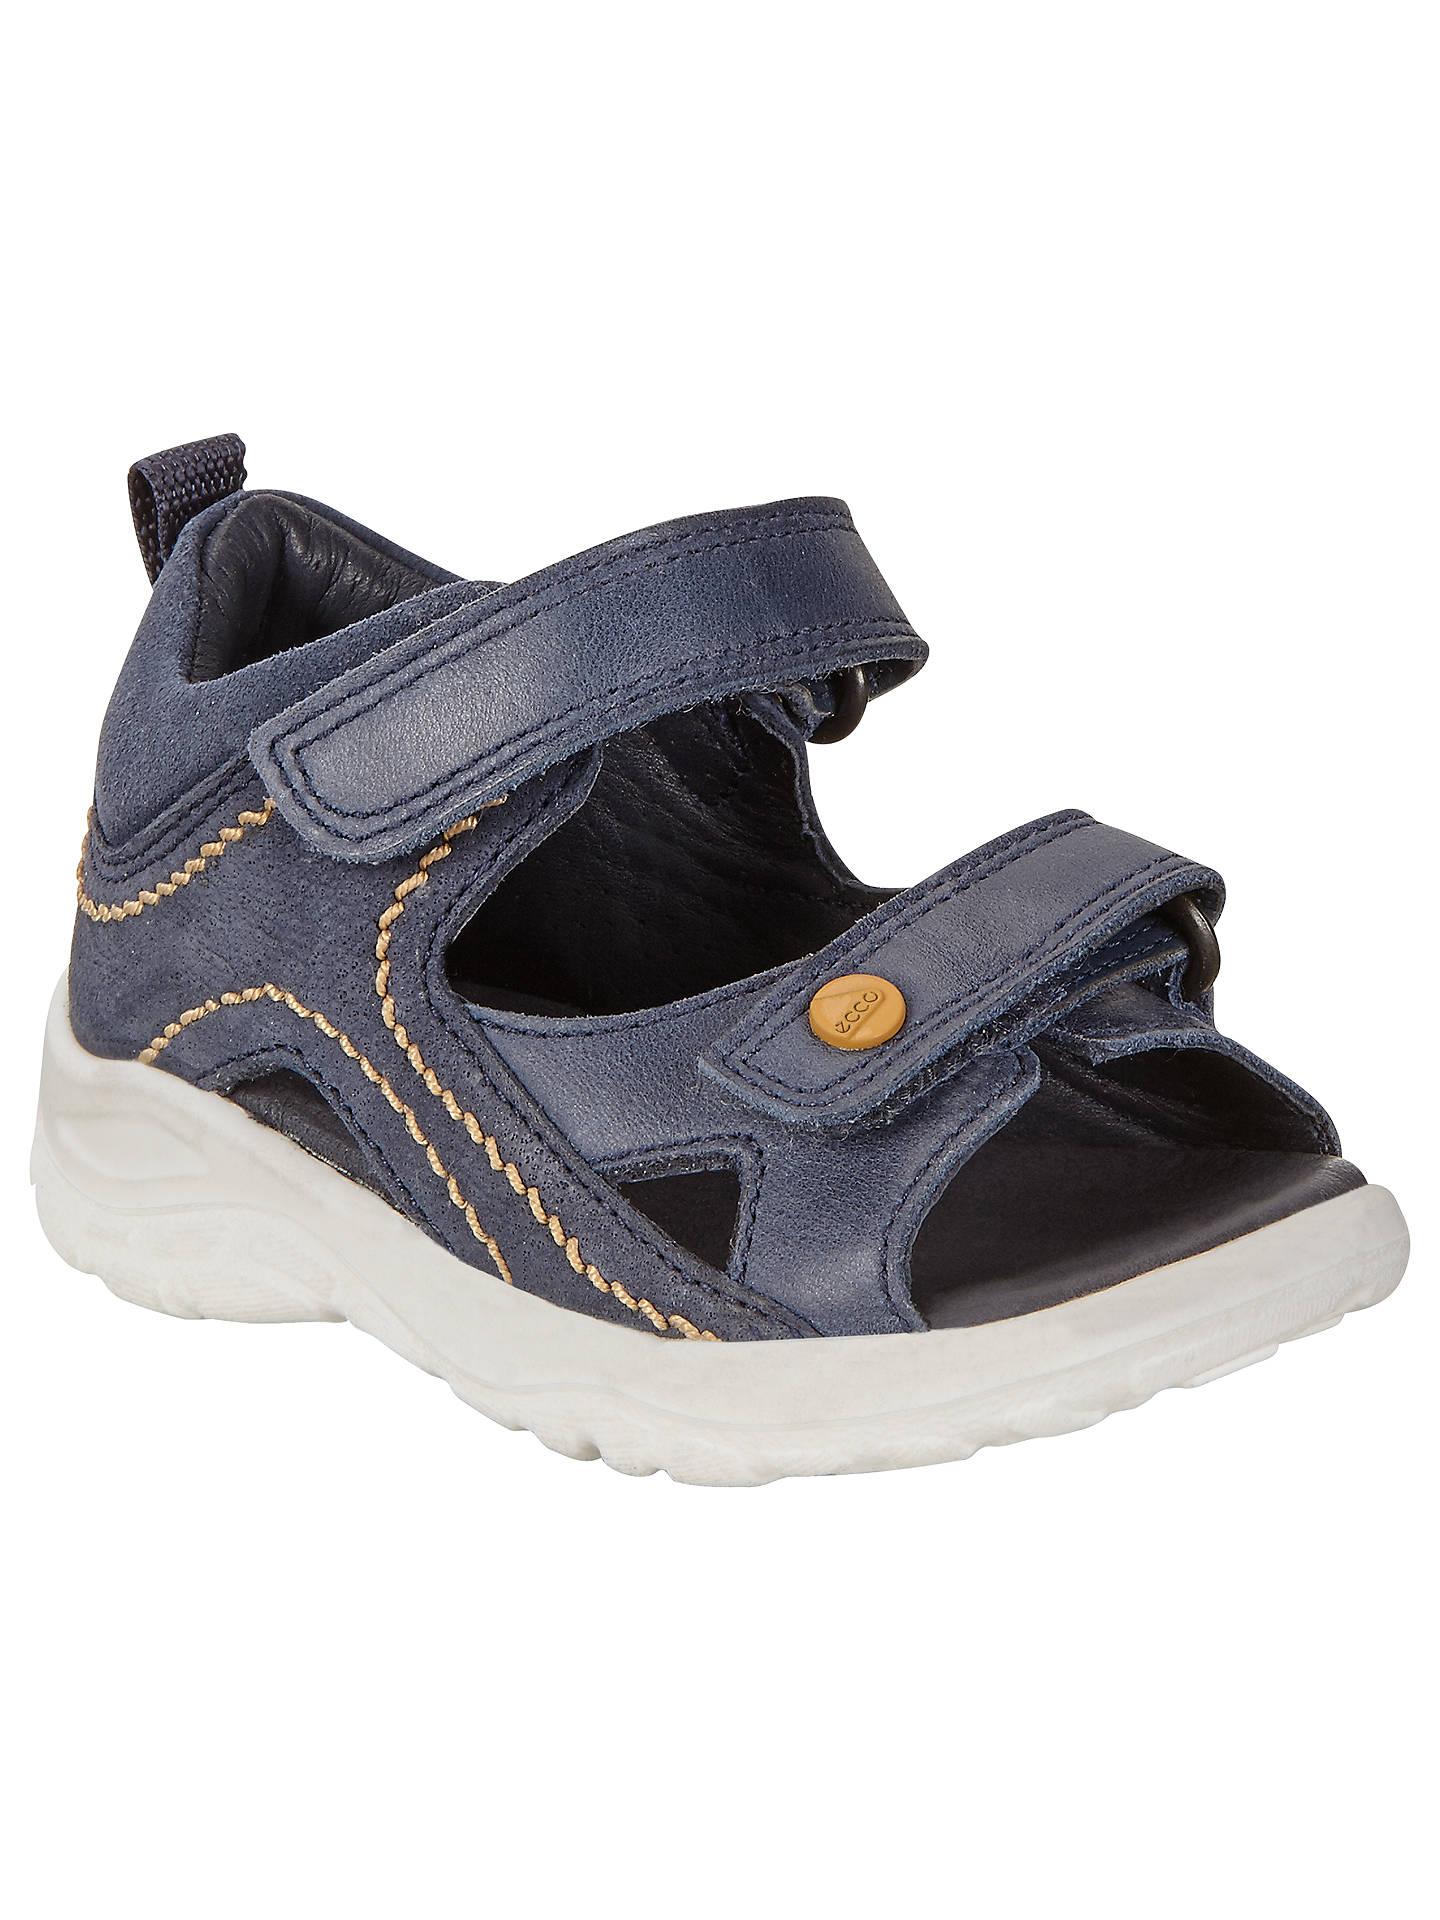 a23a8dc871df ECCO Children s Peekaboo Sandals at John Lewis   Partners